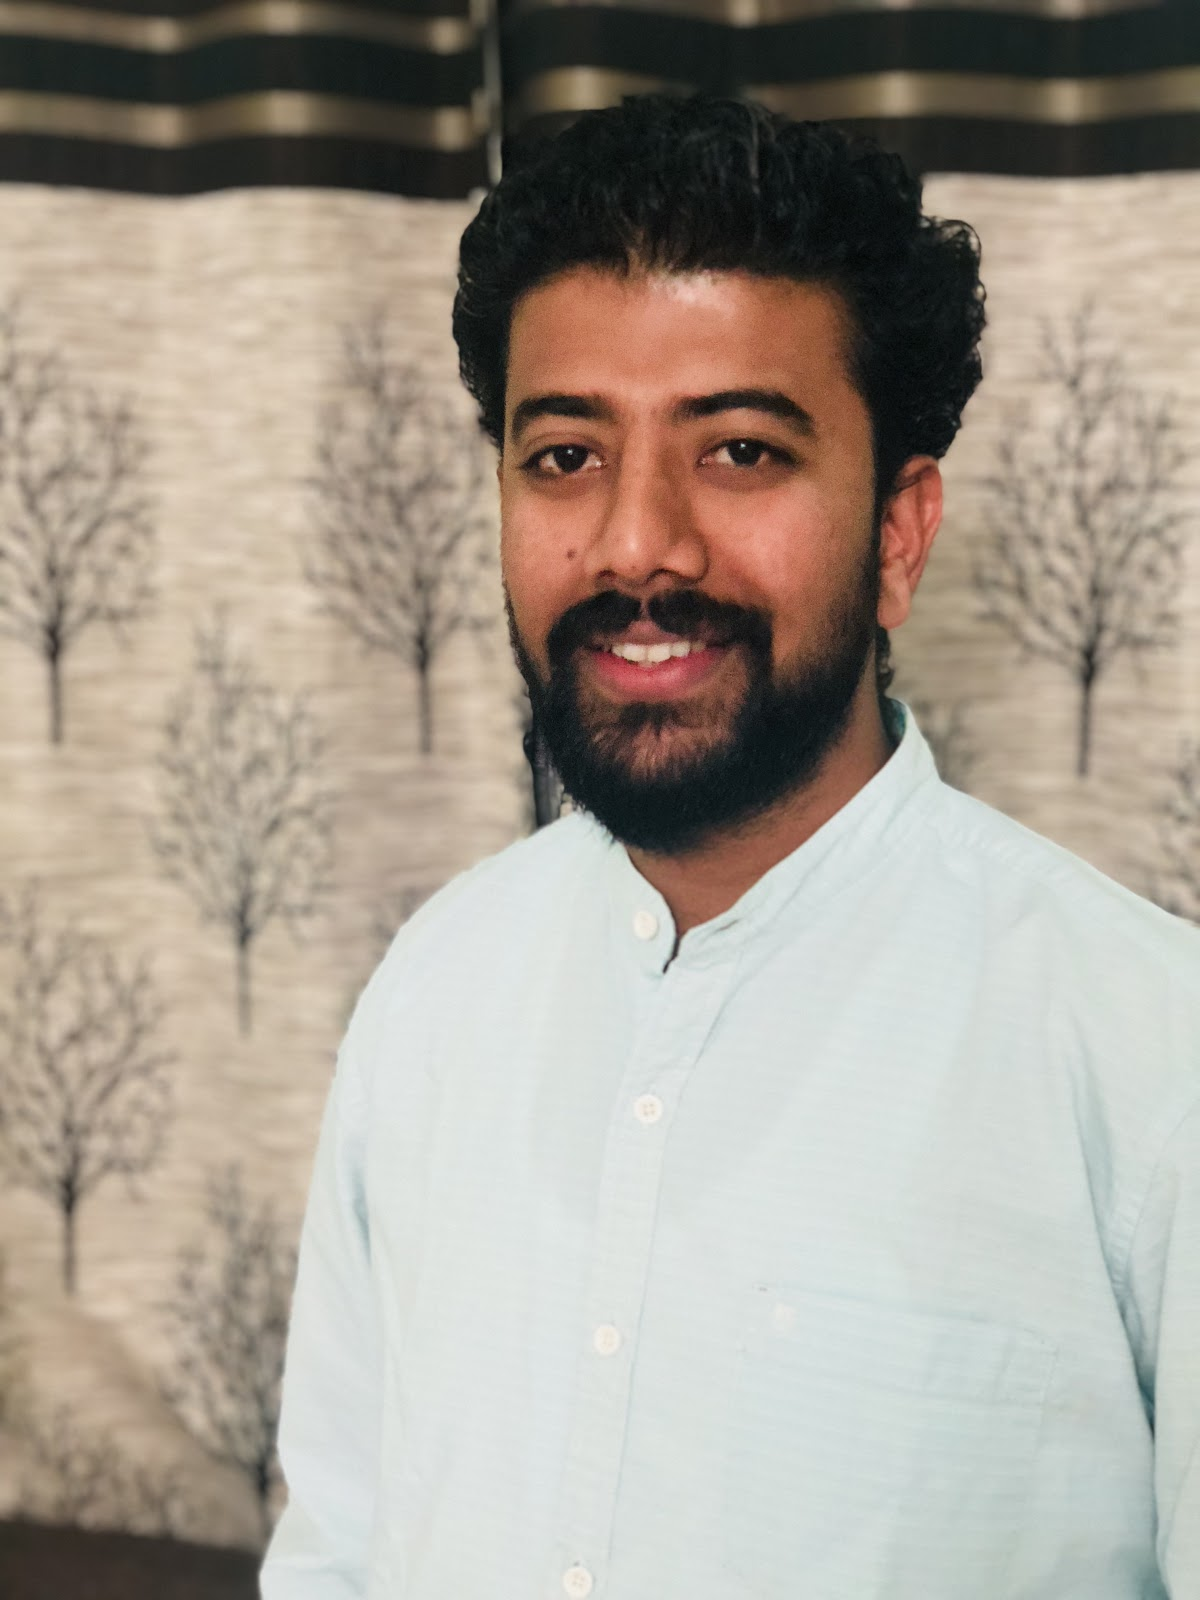 Shashank H N, QA Engineer